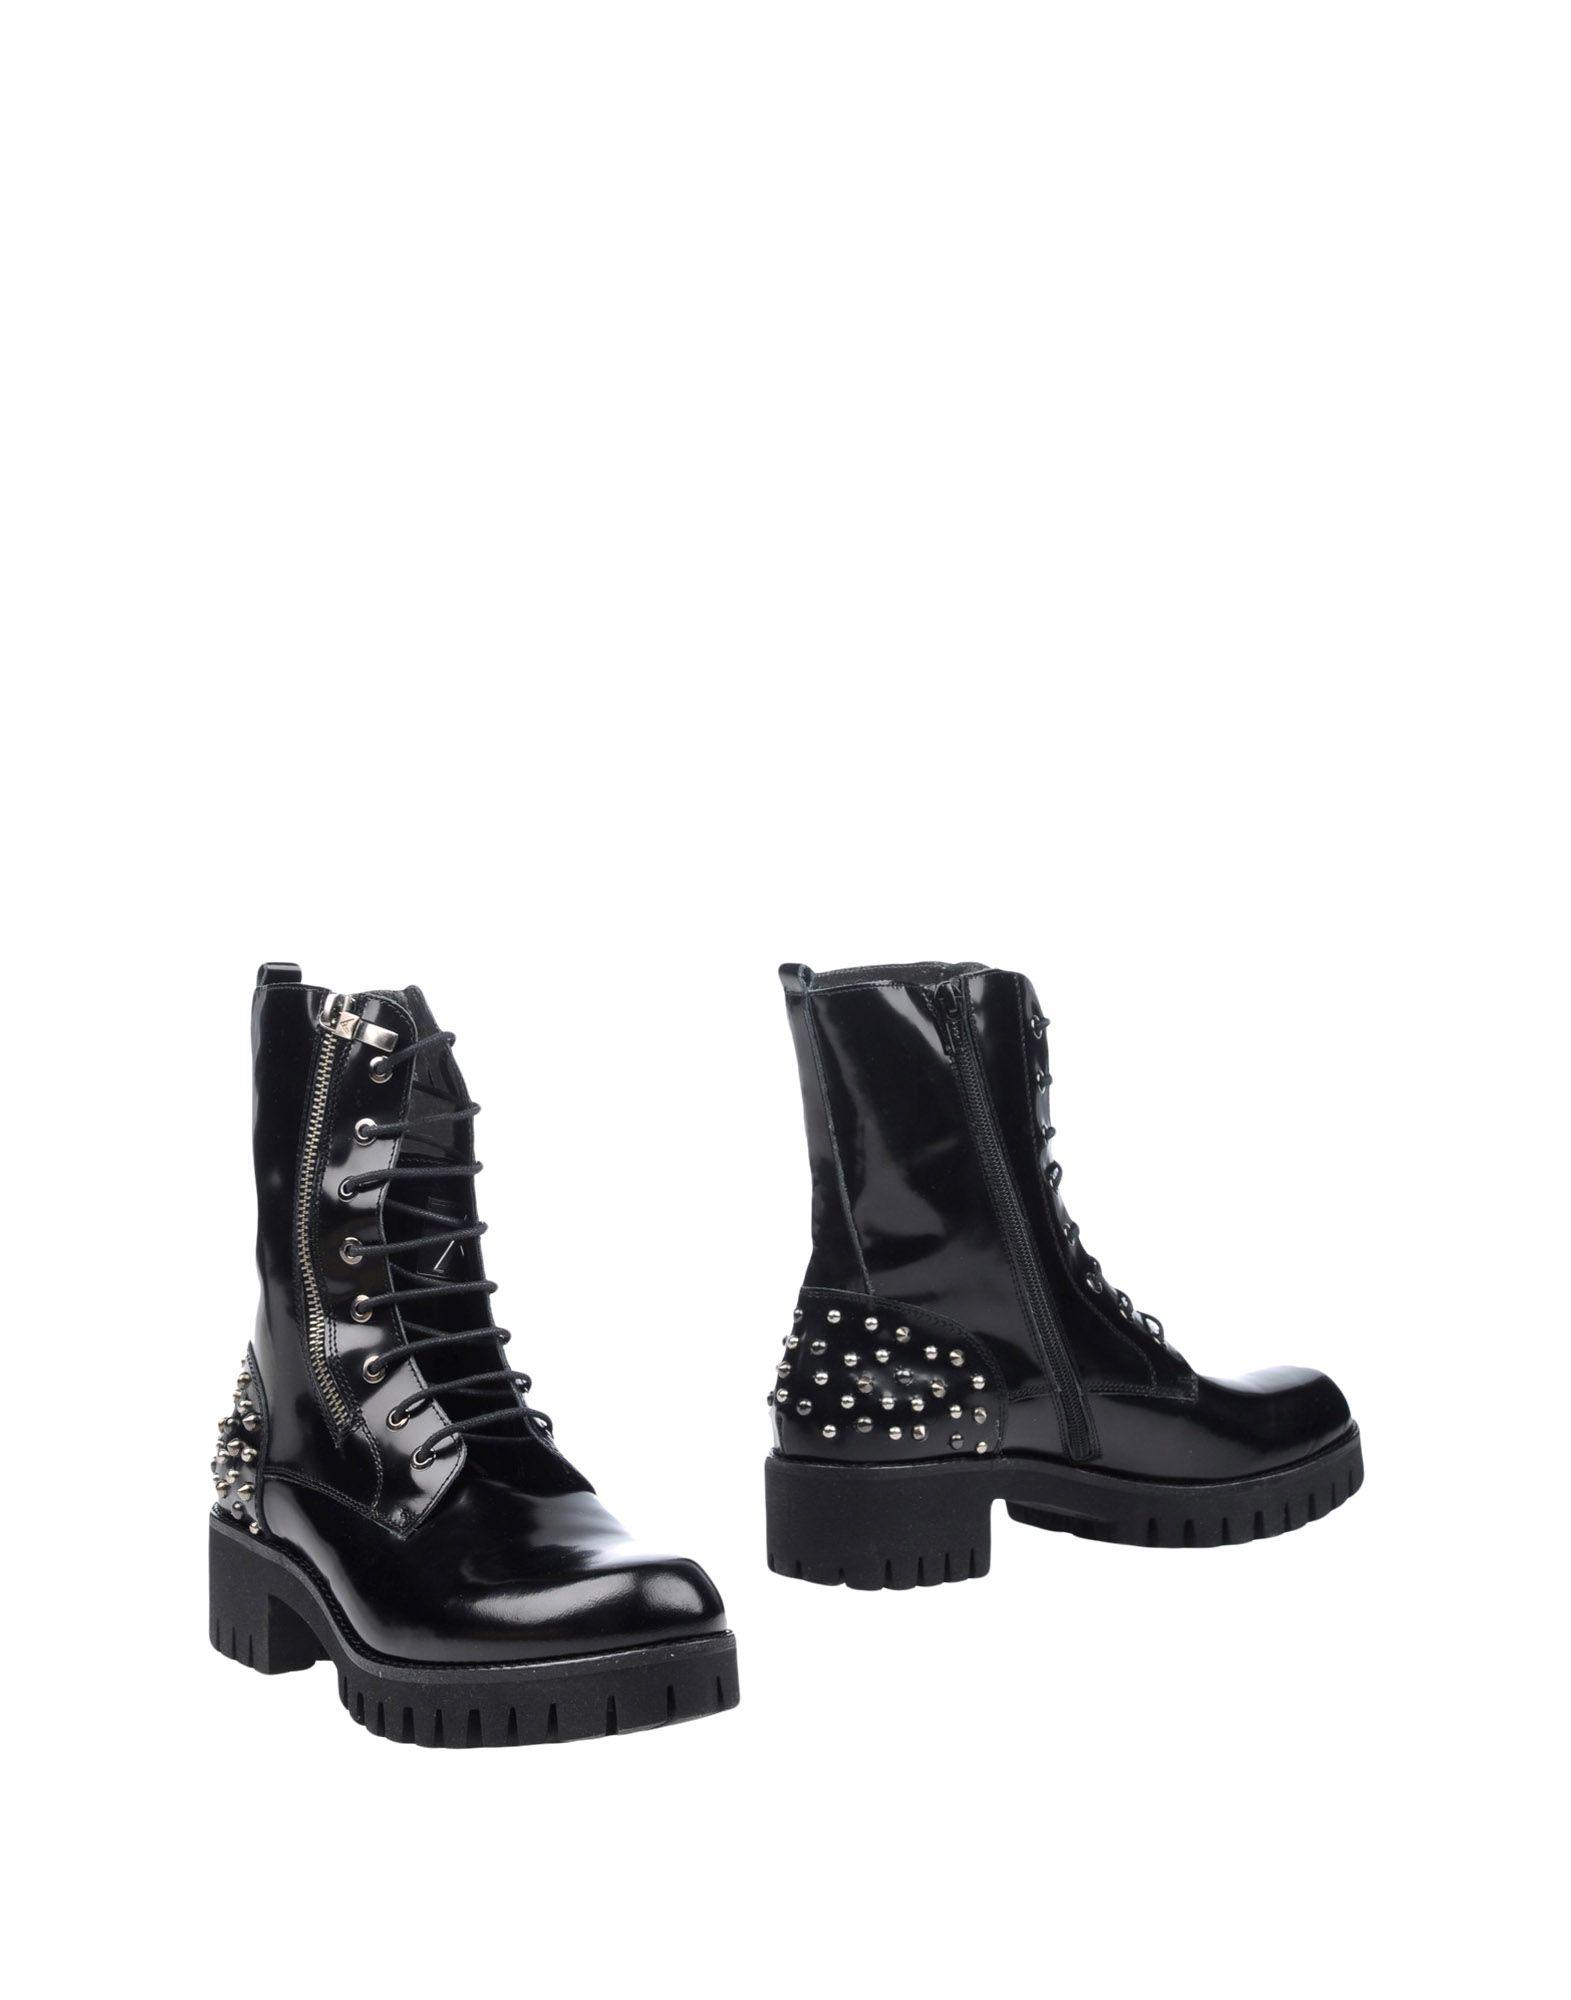 Andrea Morelli Stiefelette Damen  11300499MP Gute Qualität beliebte Schuhe